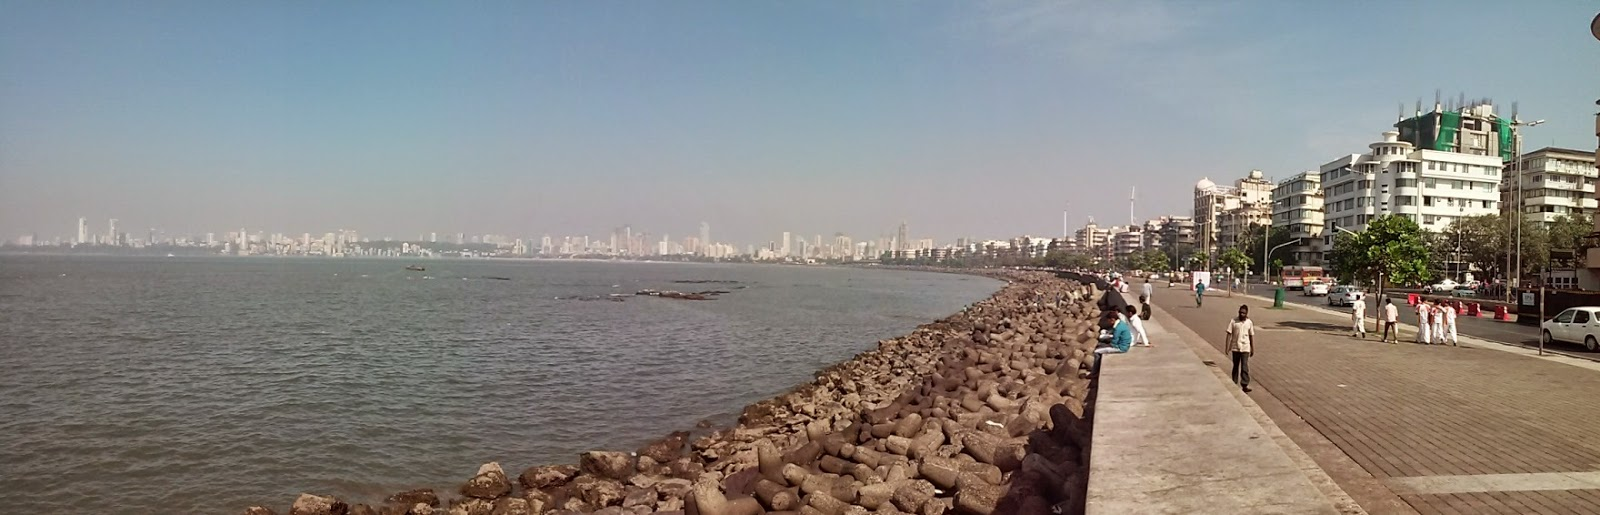 bord de mer a mumbai bombay